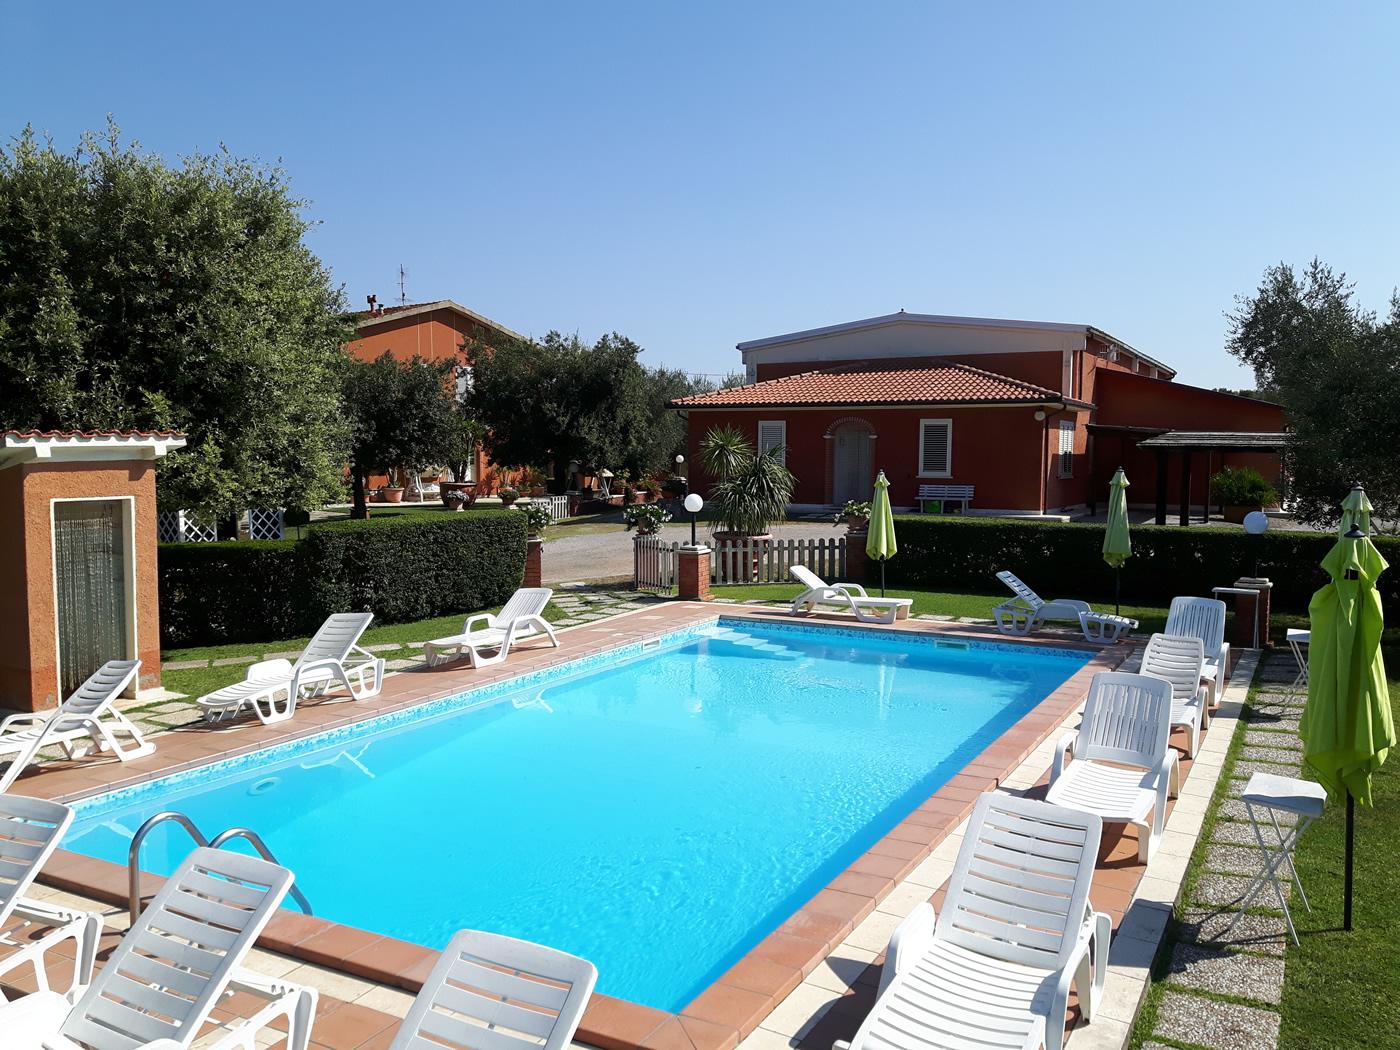 Agriturismo galeazzi con piscina in maremma toscana monte argentario manciano terme di saturnia - Saturnia agriturismo con piscina ...